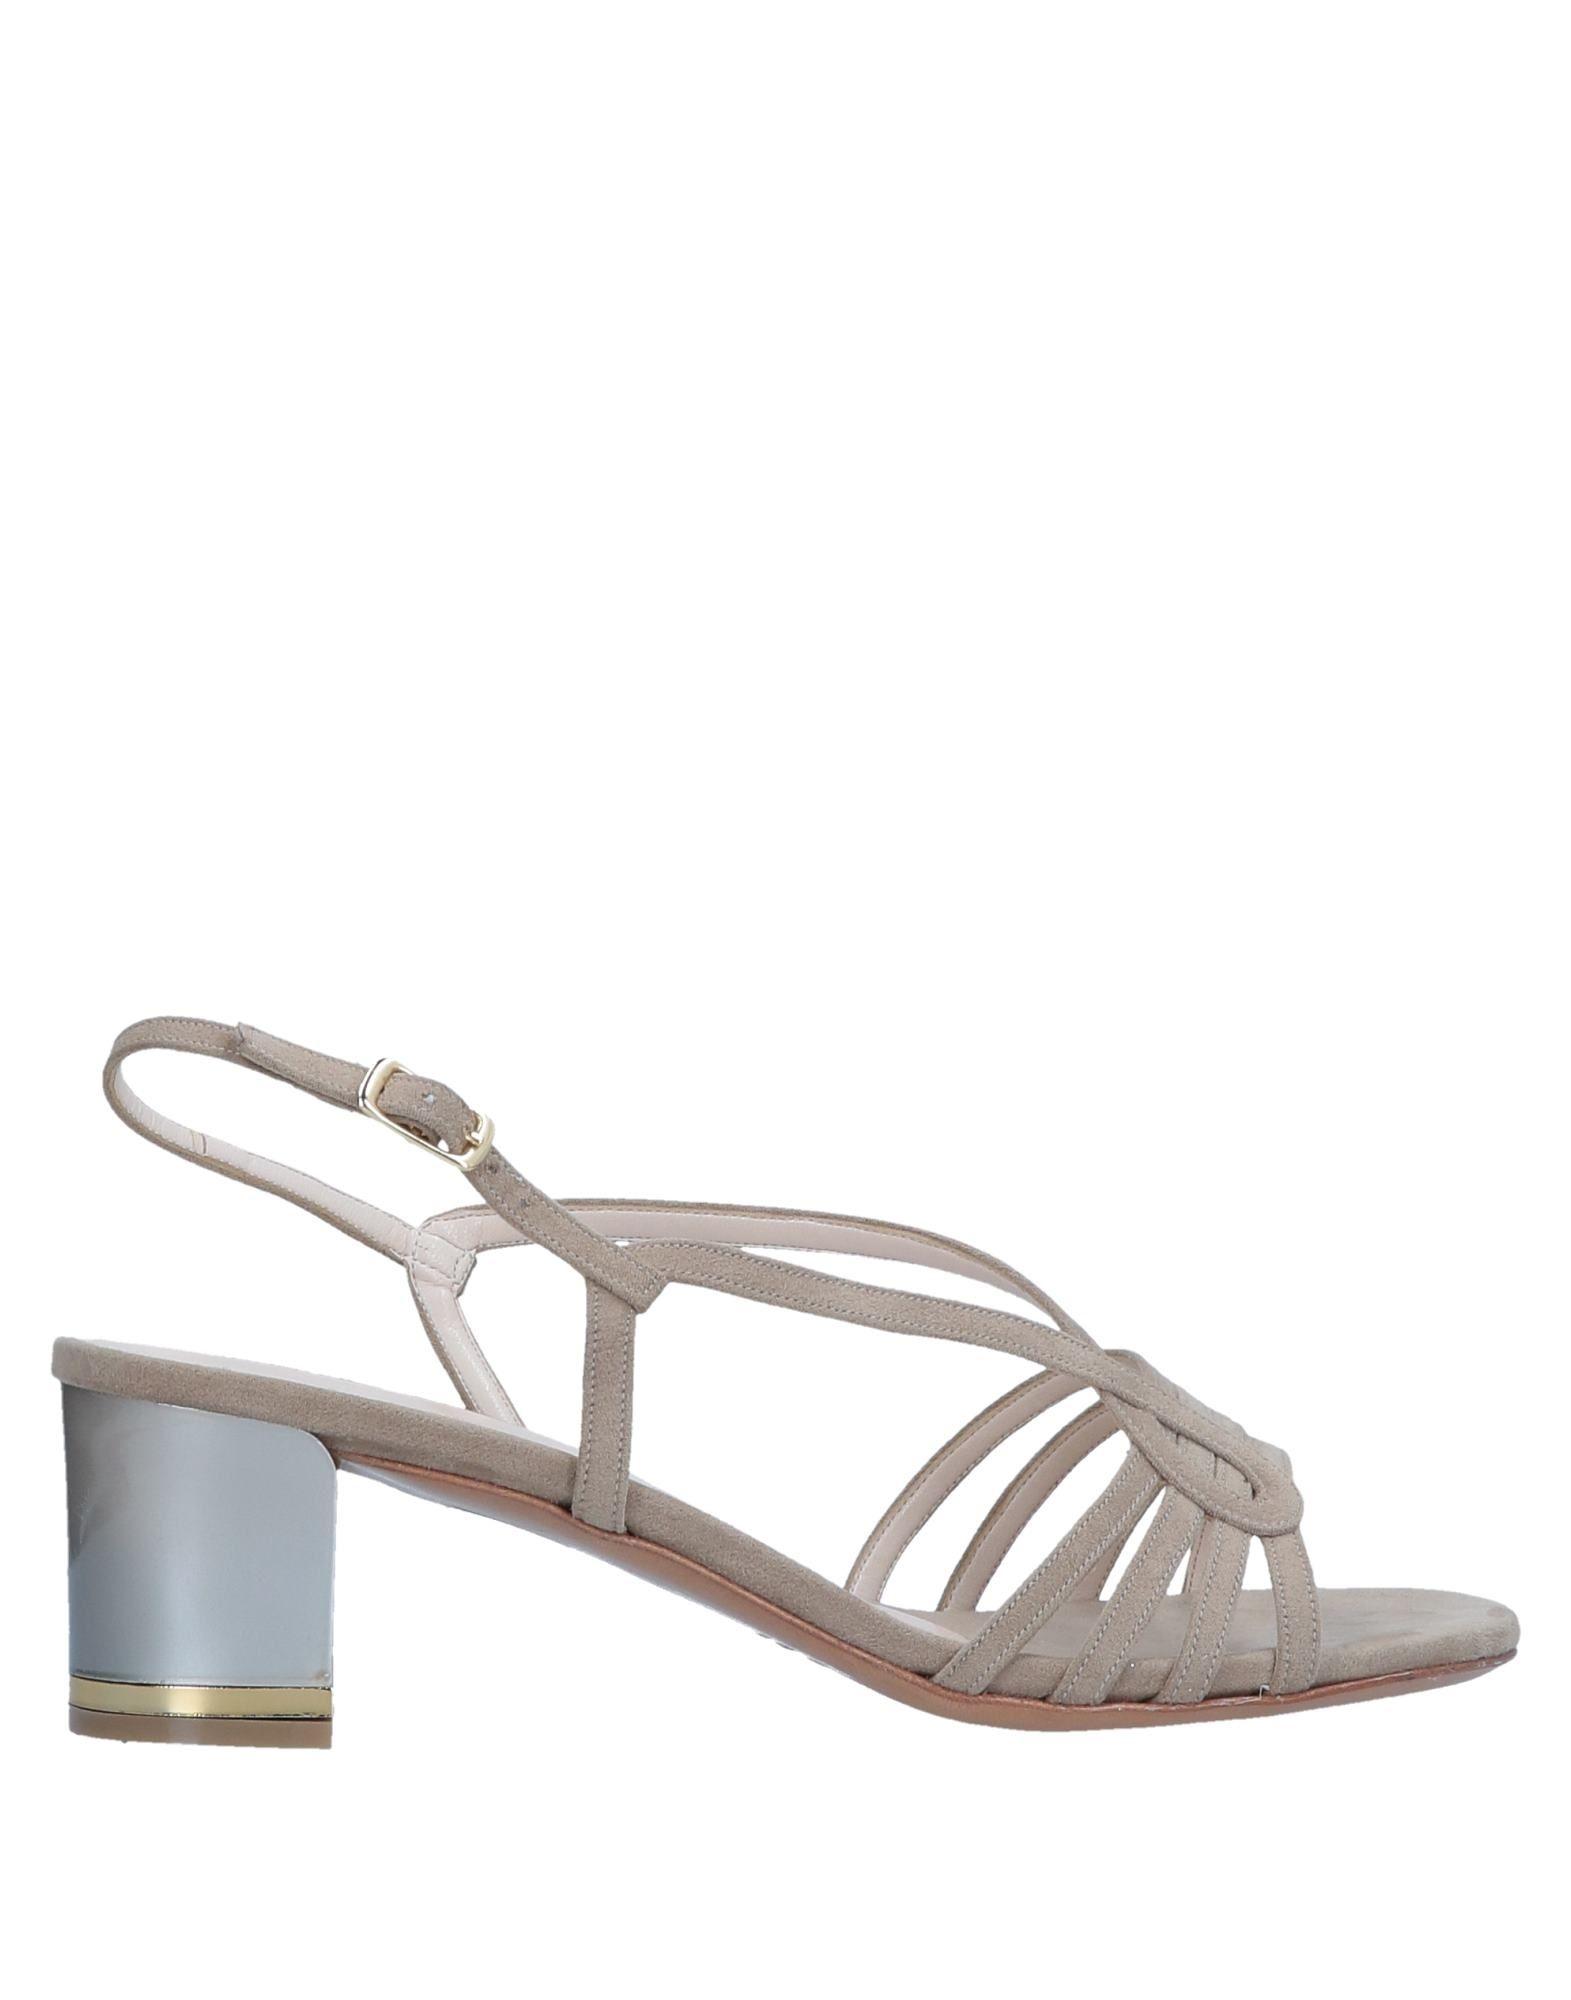 Albano Sandals - Women Albano Sandals online on 11549819BB  United Kingdom - 11549819BB on f8b860